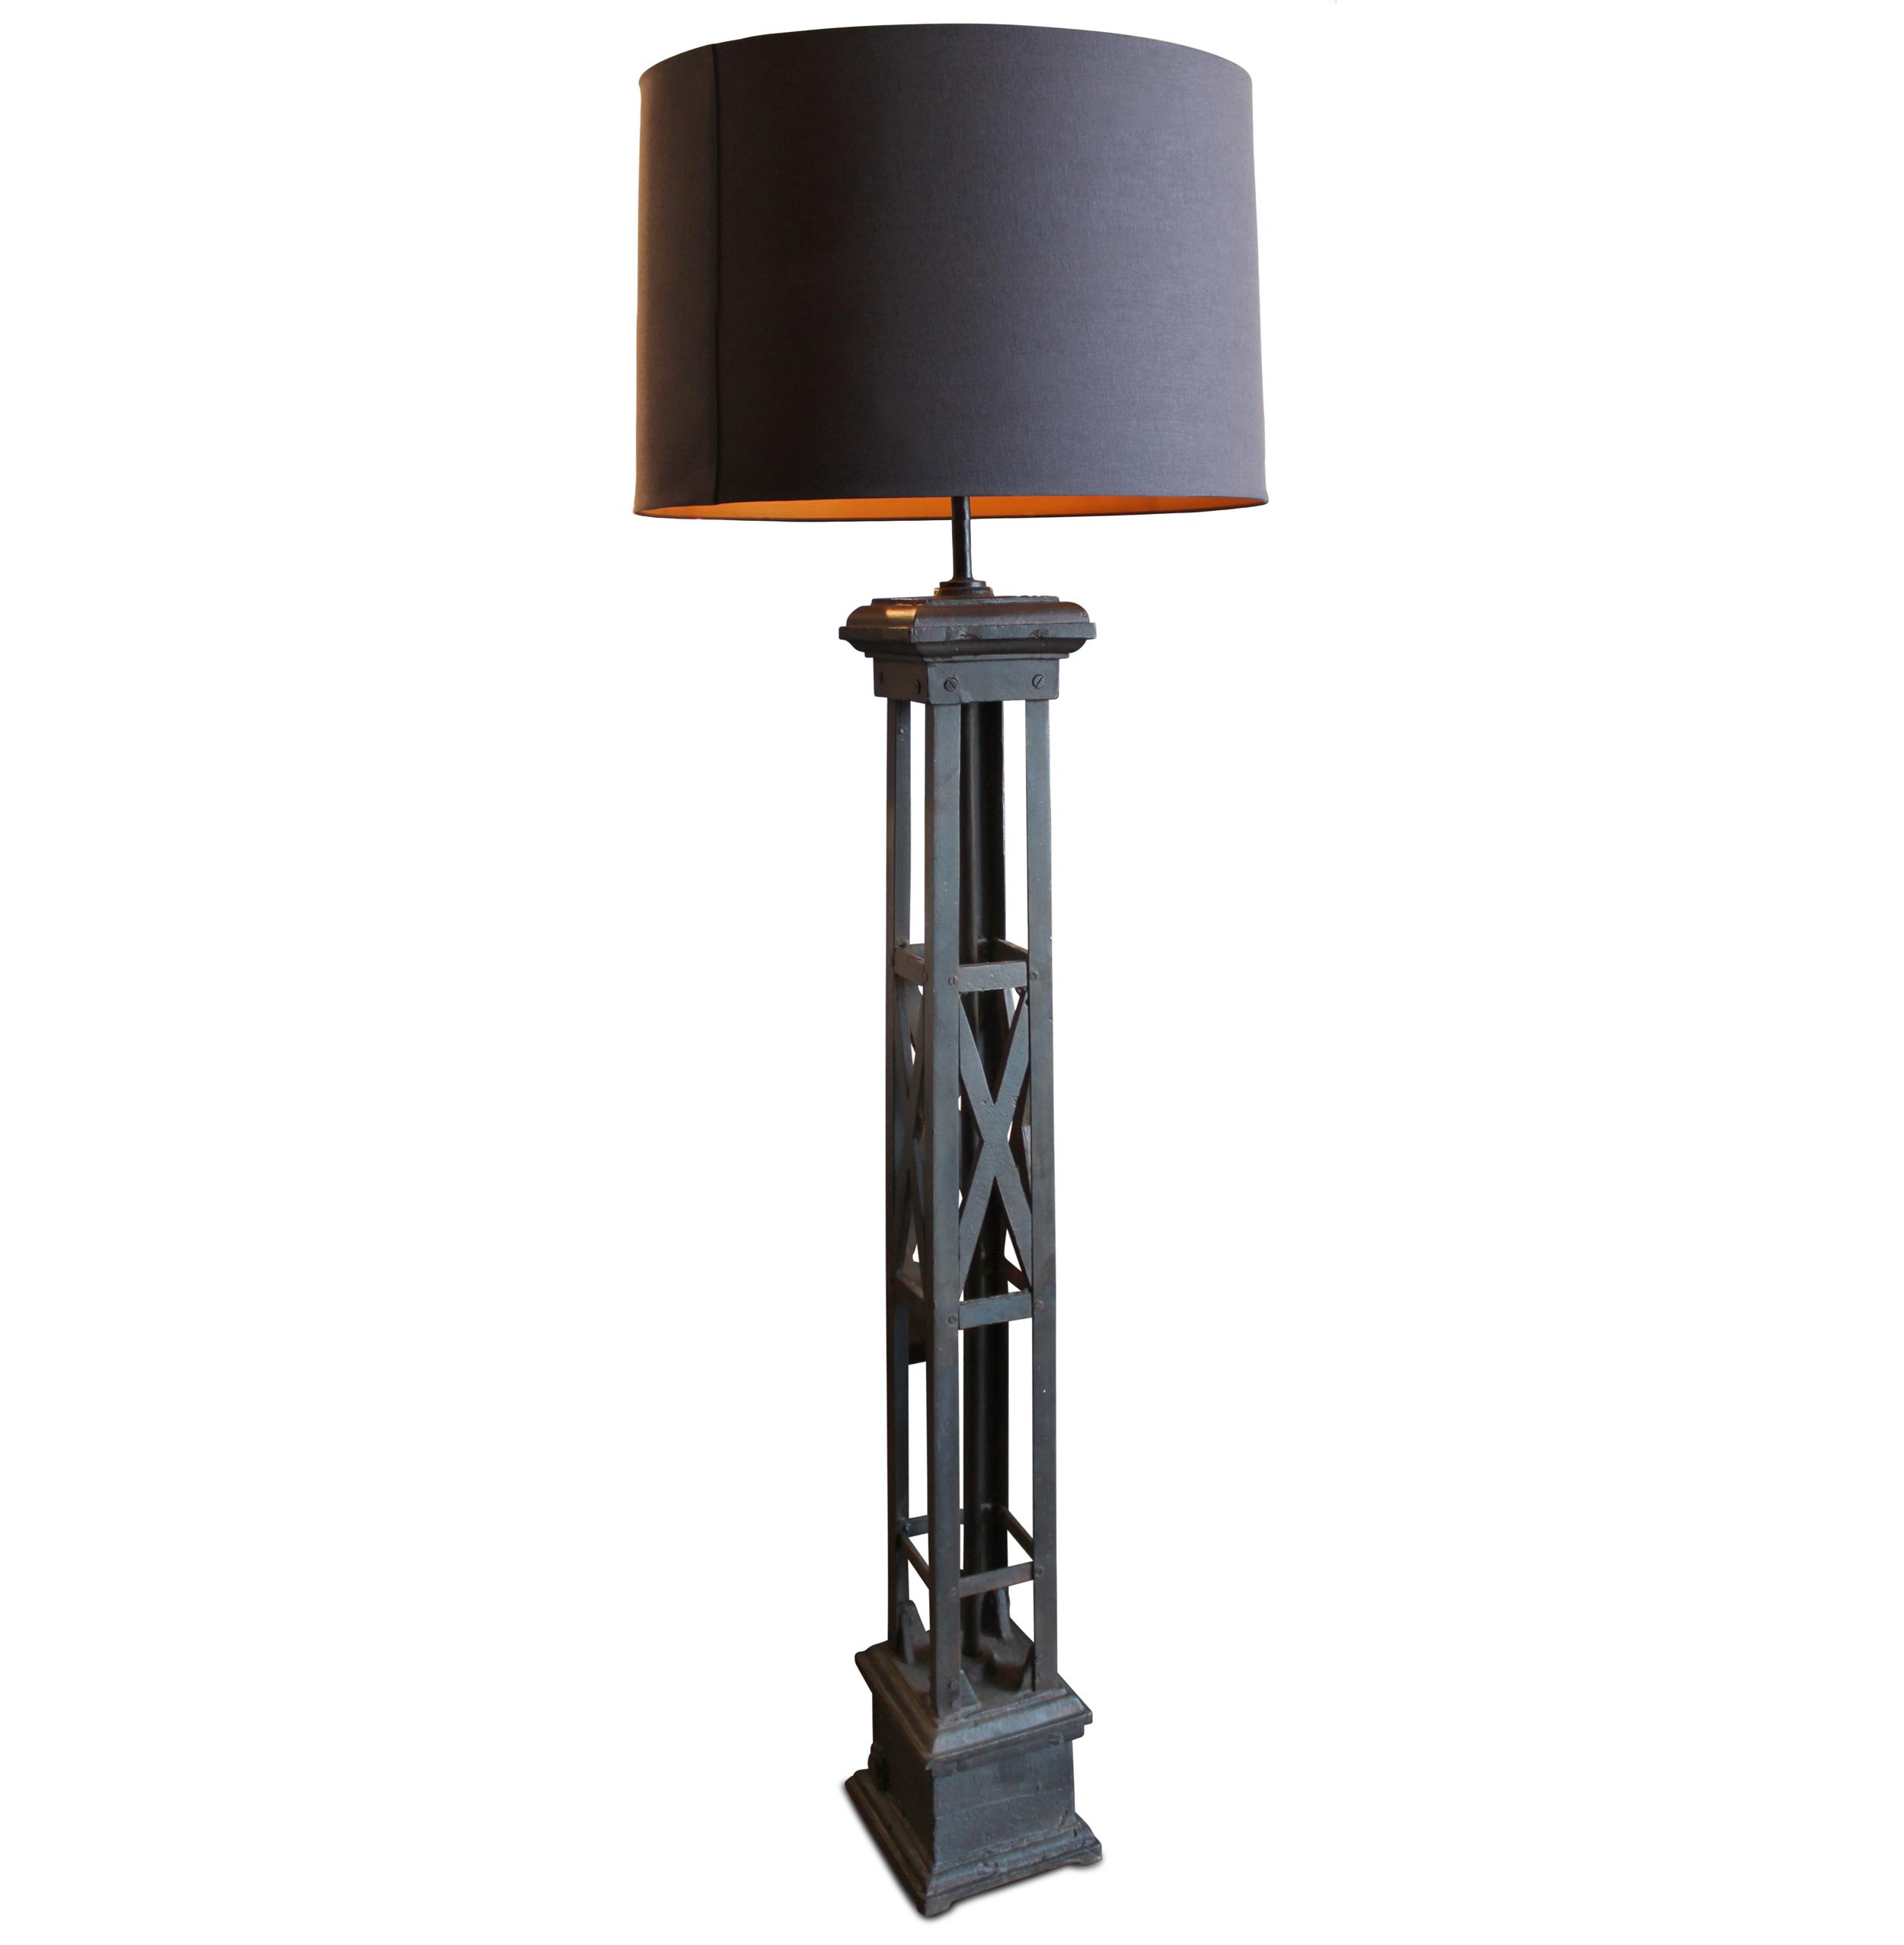 Somerson Industrial Loft Vintage Gate Post Floor Lamp